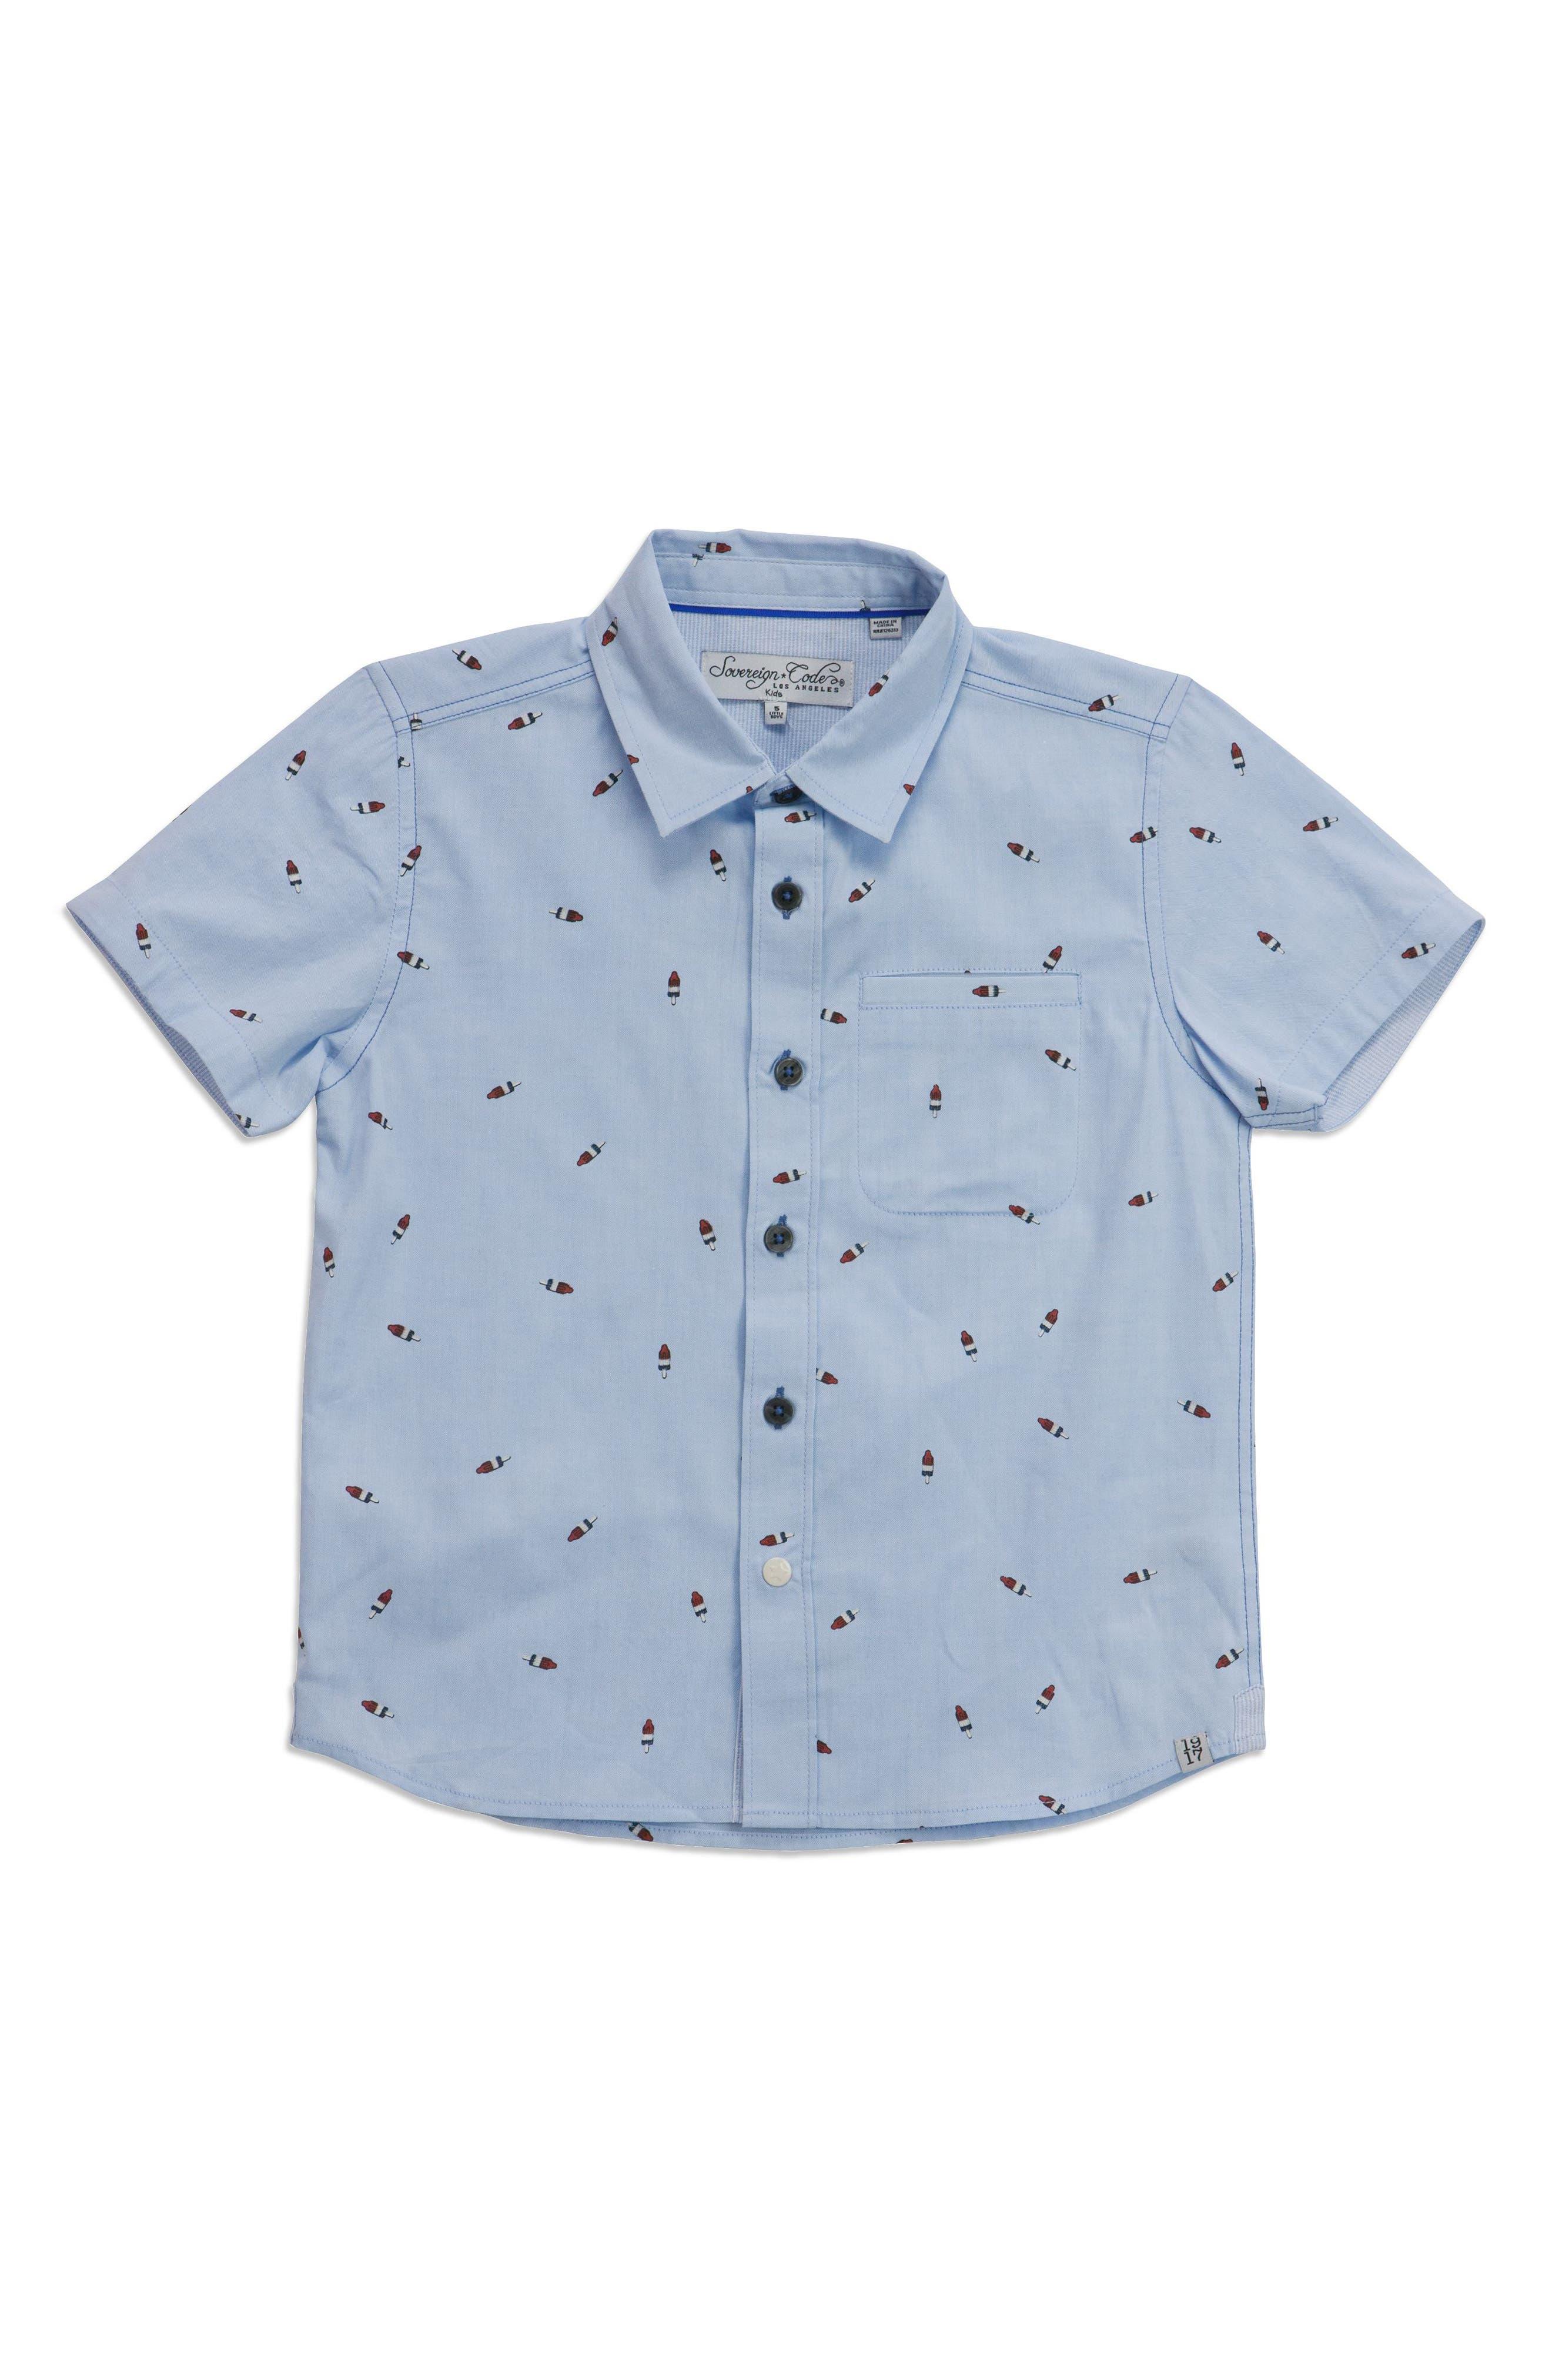 Sovereign Code Pismo Bomb Pop Woven Shirt